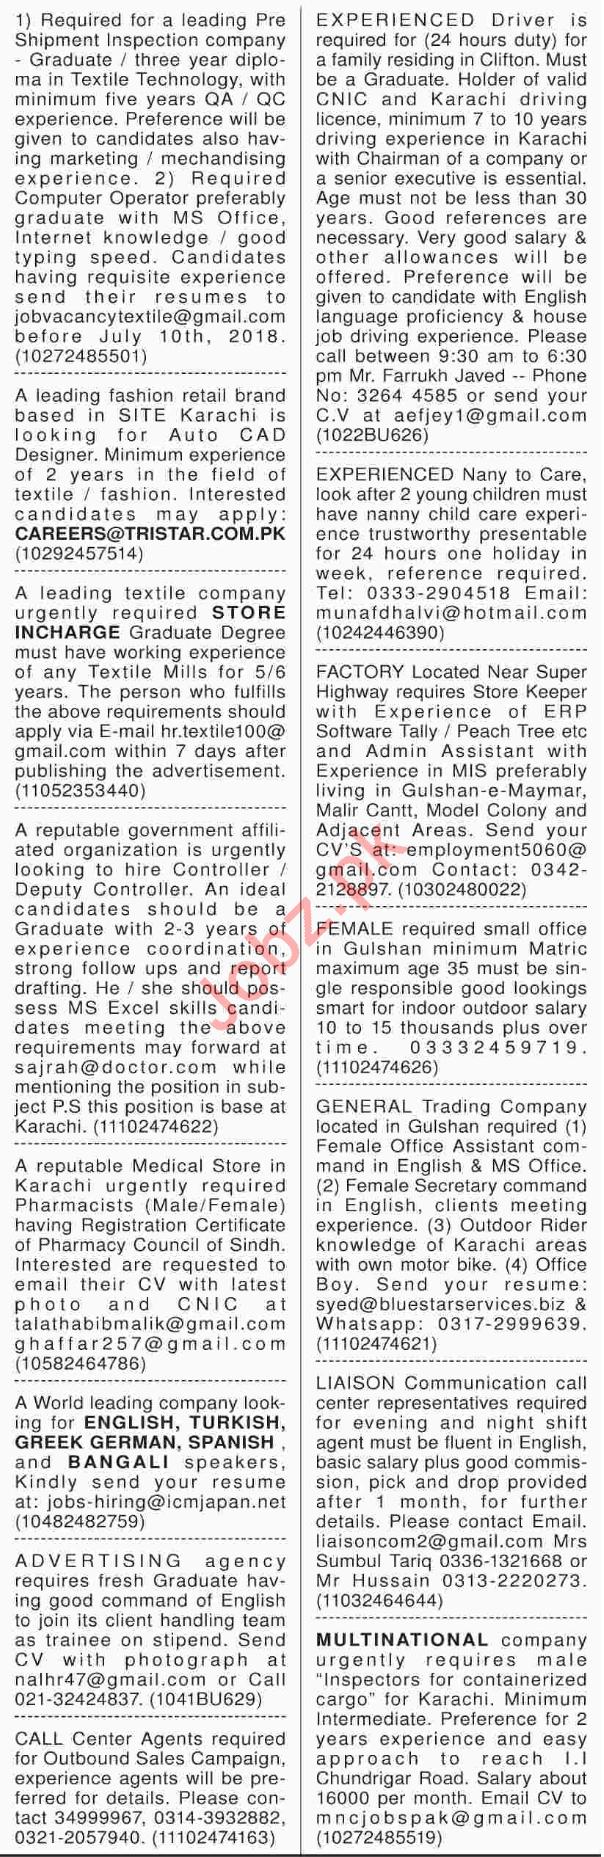 Daily Dawn Newspaper Sunday Classified Ads 2018